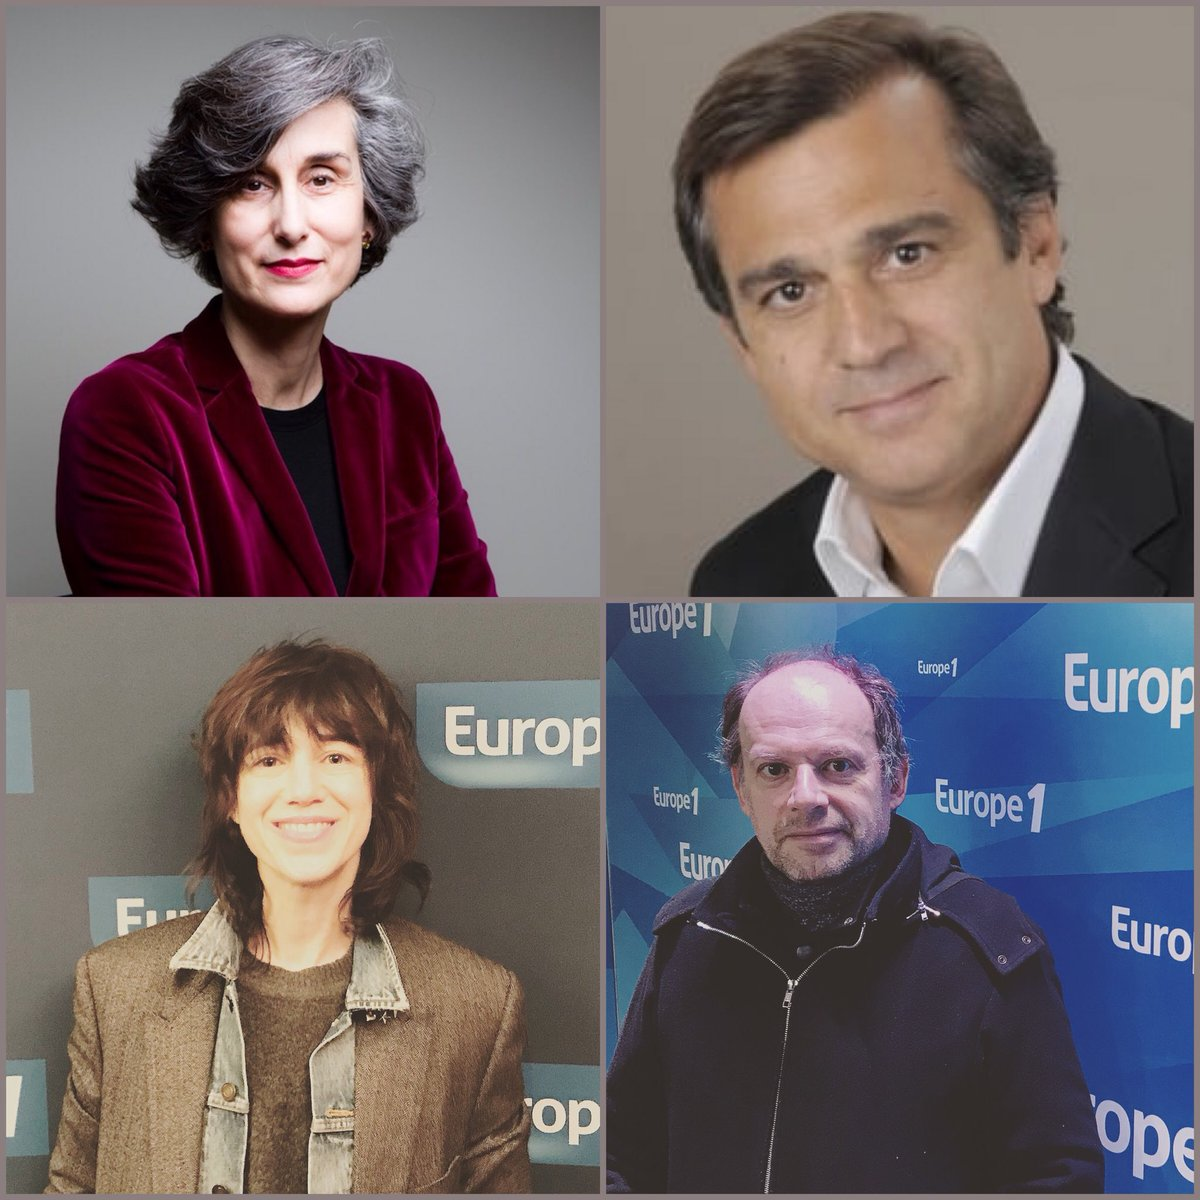 La Promesse De Noel.Europe 1 On Twitter 1 Sylvia Desazars Politologue